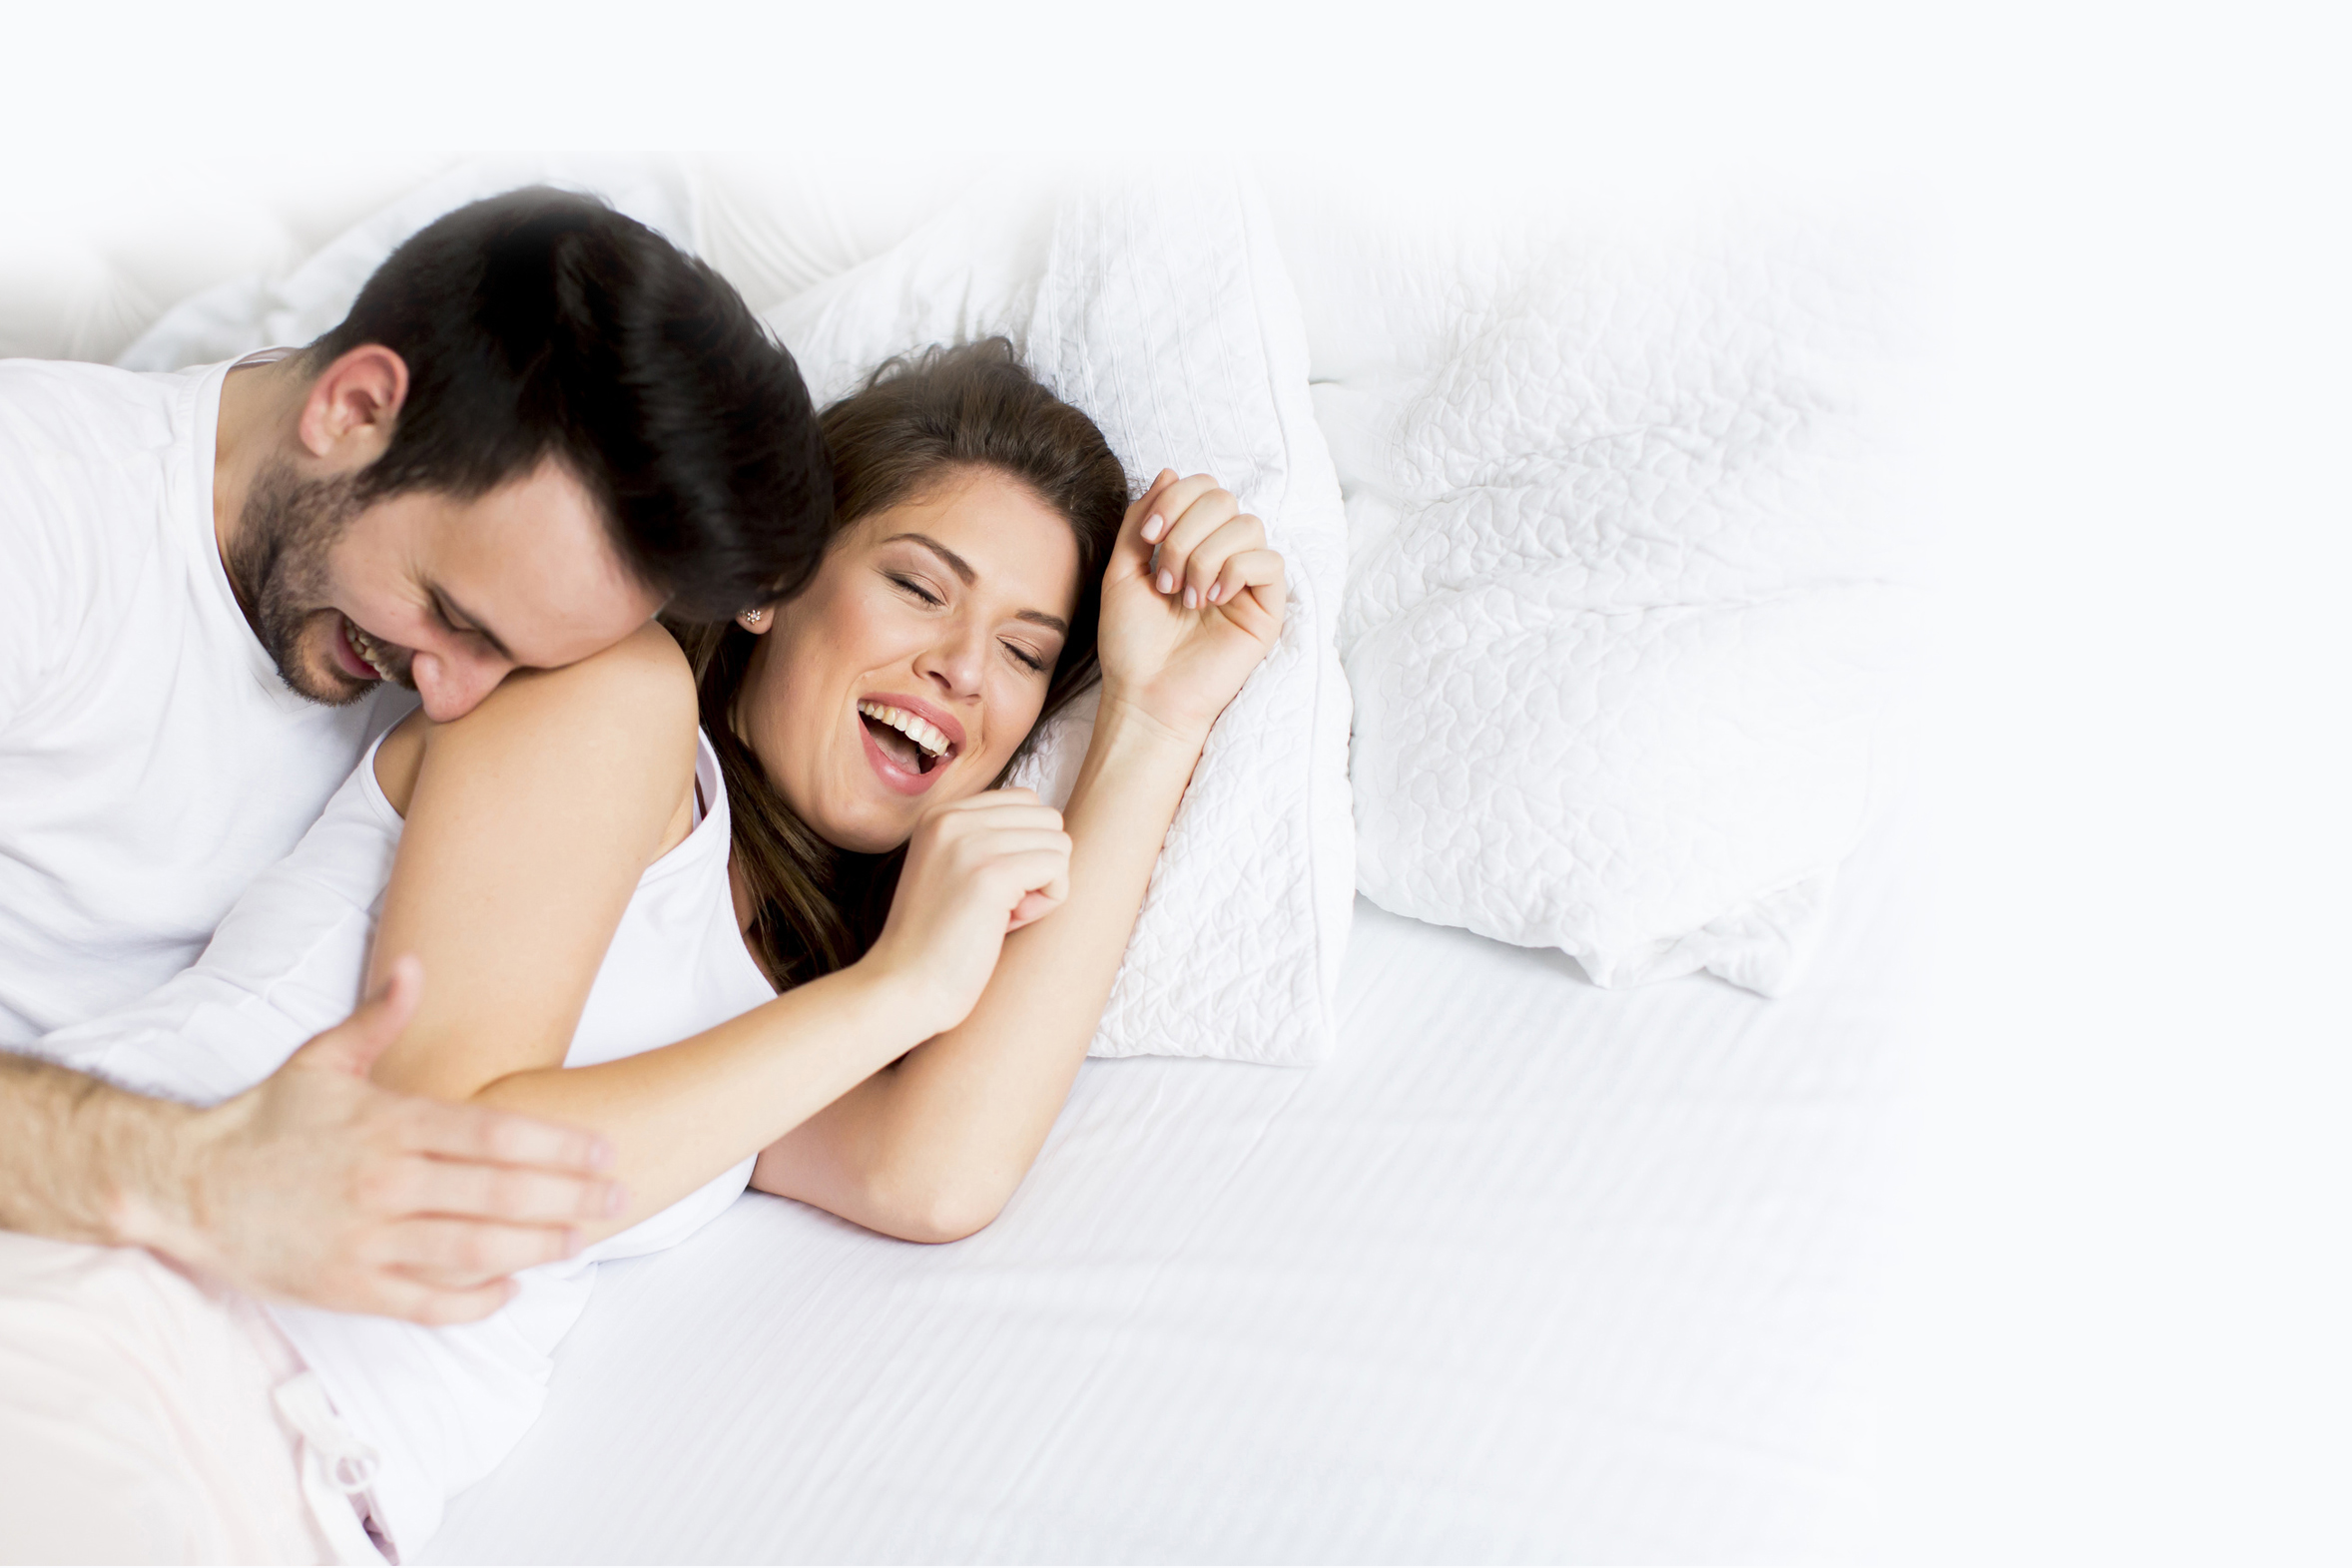 Fotos de sexo filipina gratis